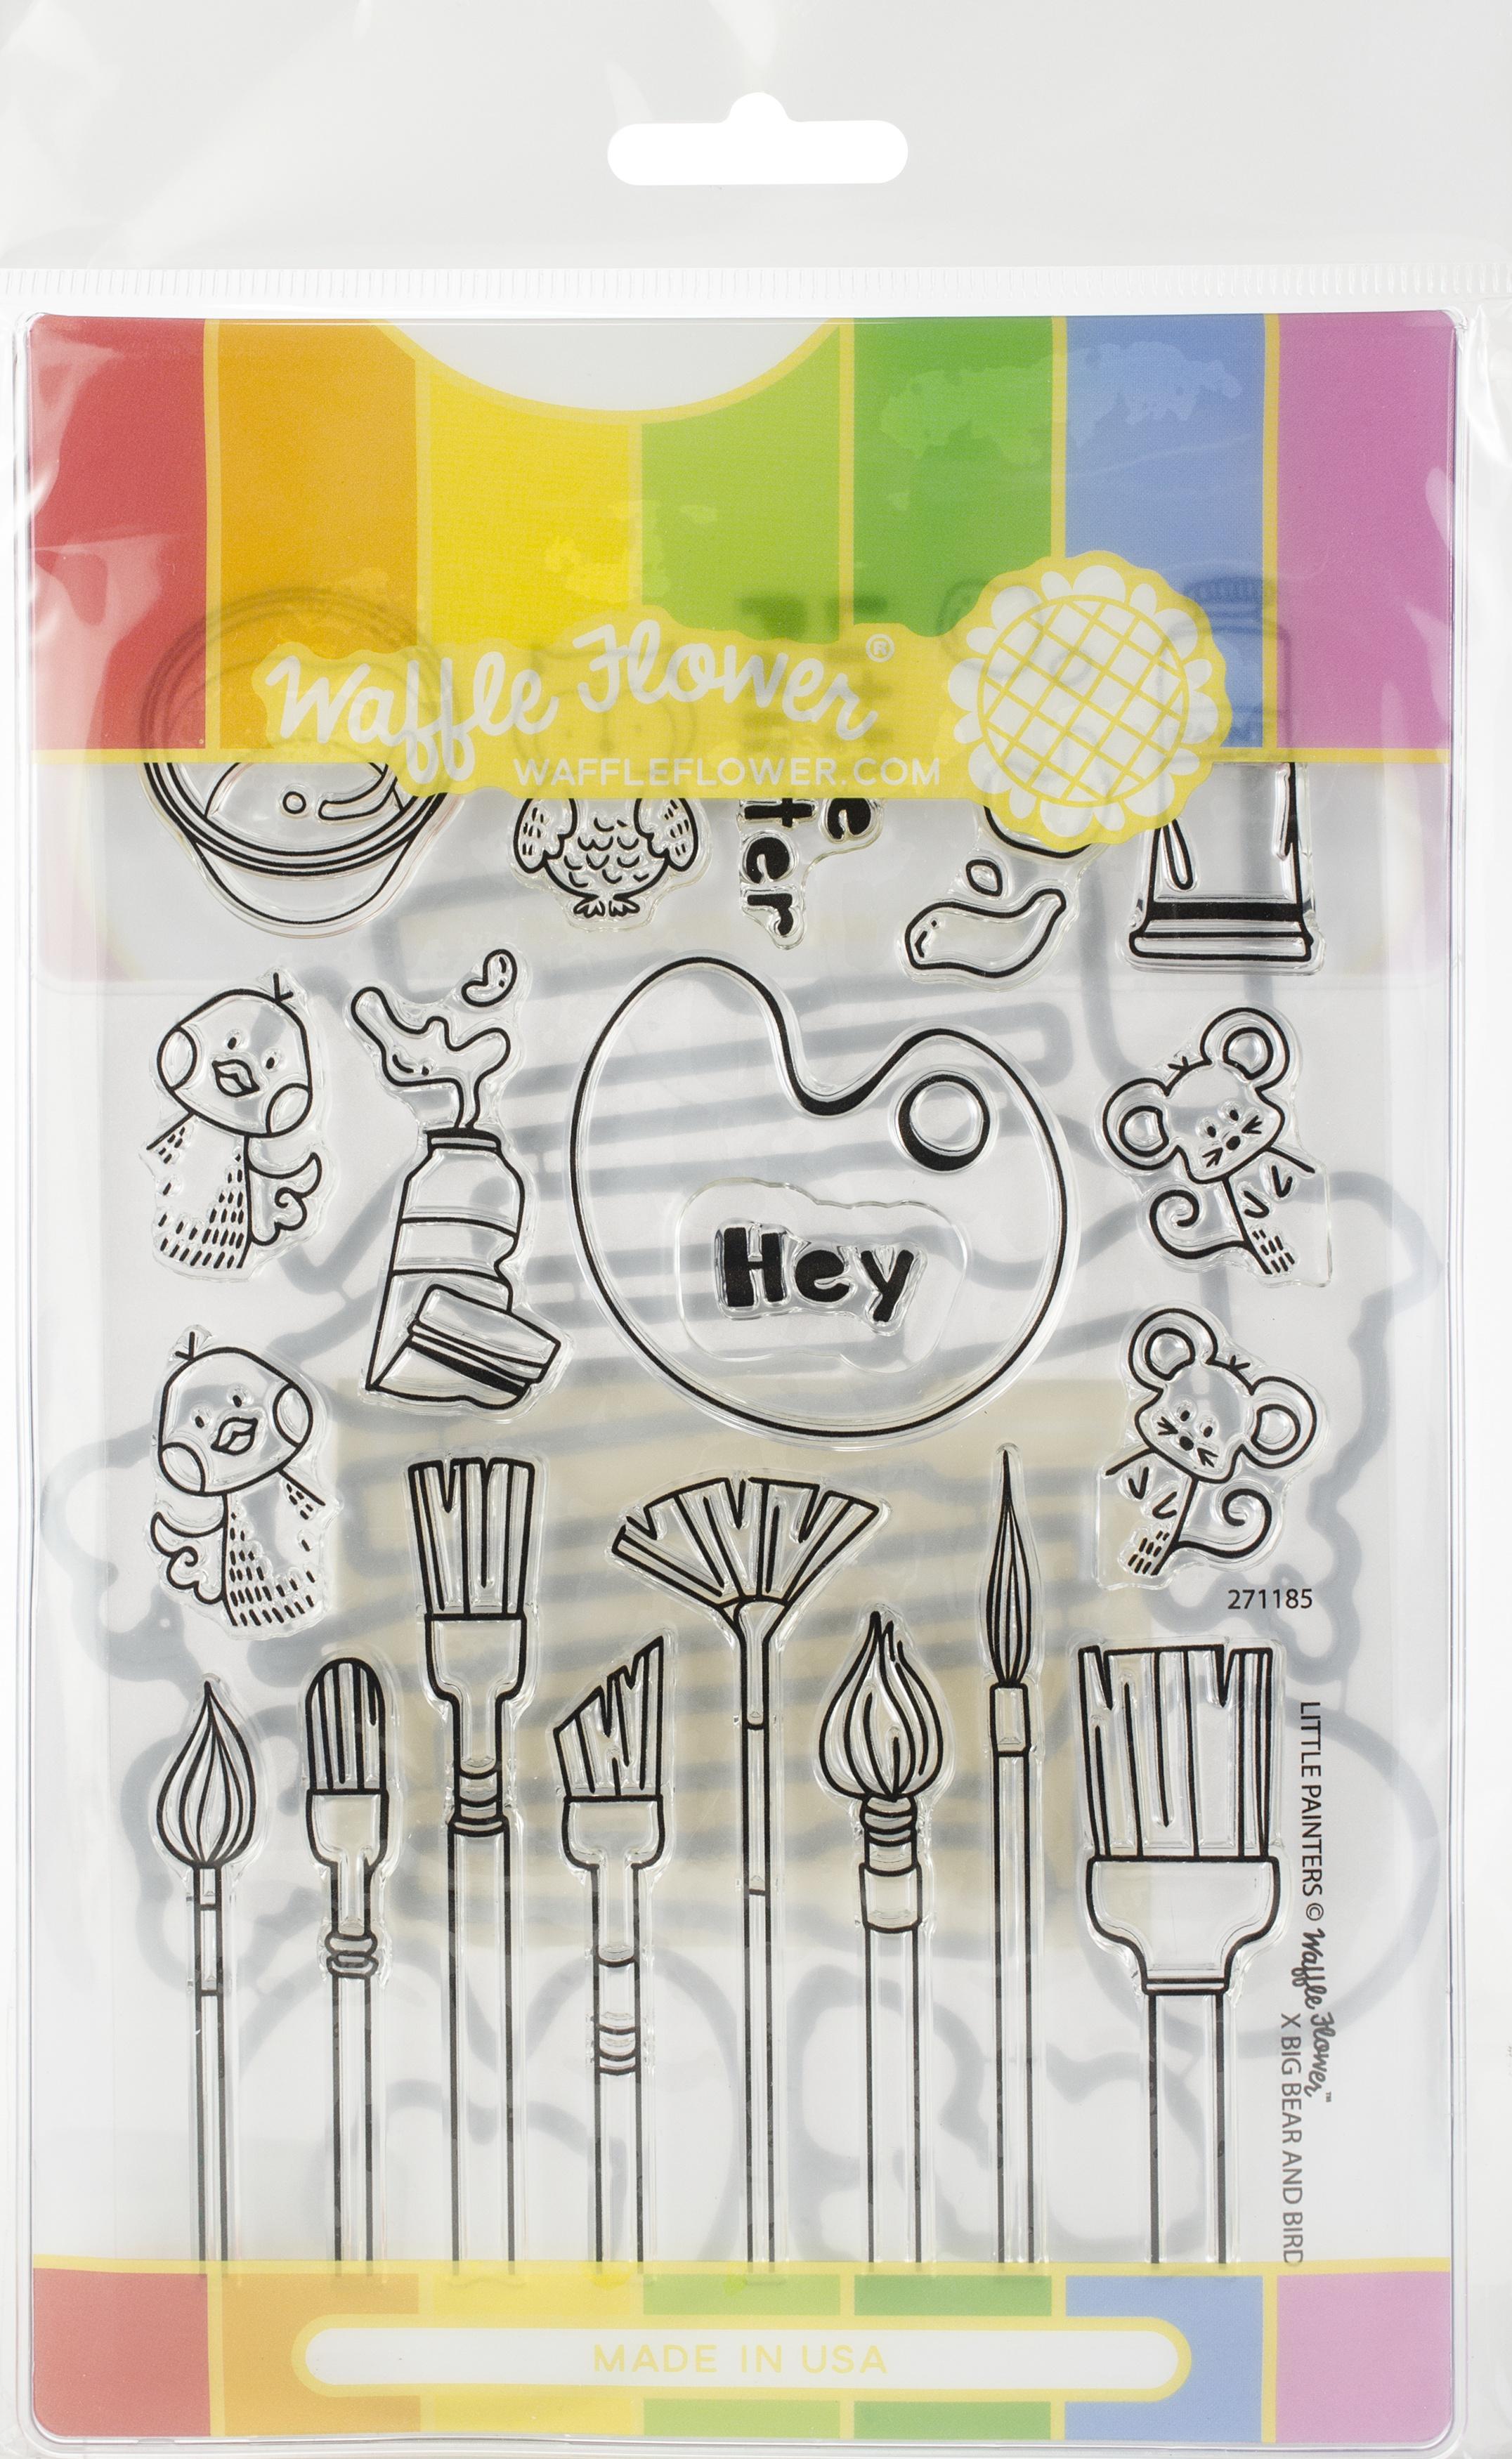 Waffle Flower Stamp & Die Set-Little Painters